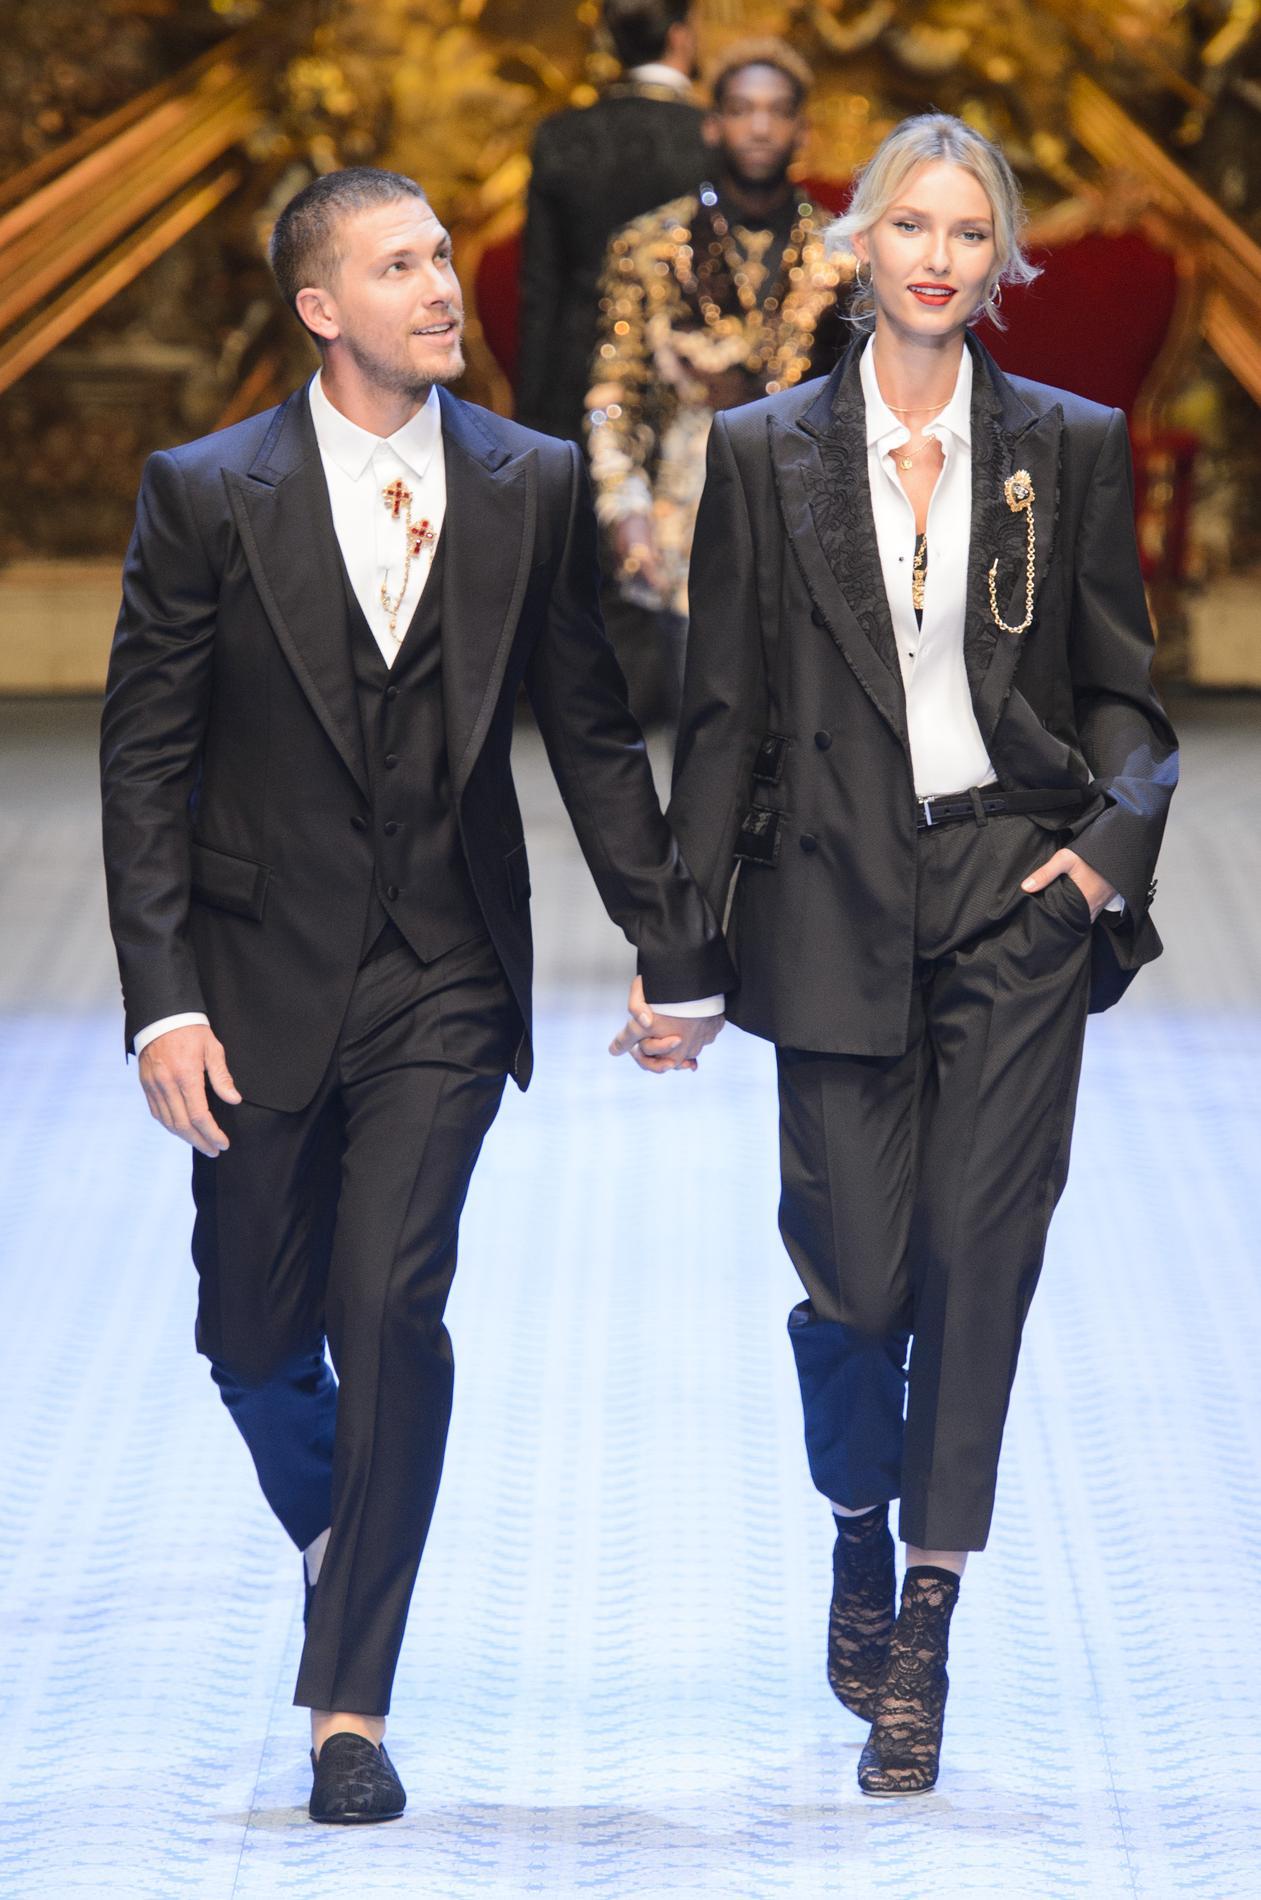 ff8ff27f0d Monica Bellucci défile à Milan pour Dolce & Gabbana - Madame Figaro